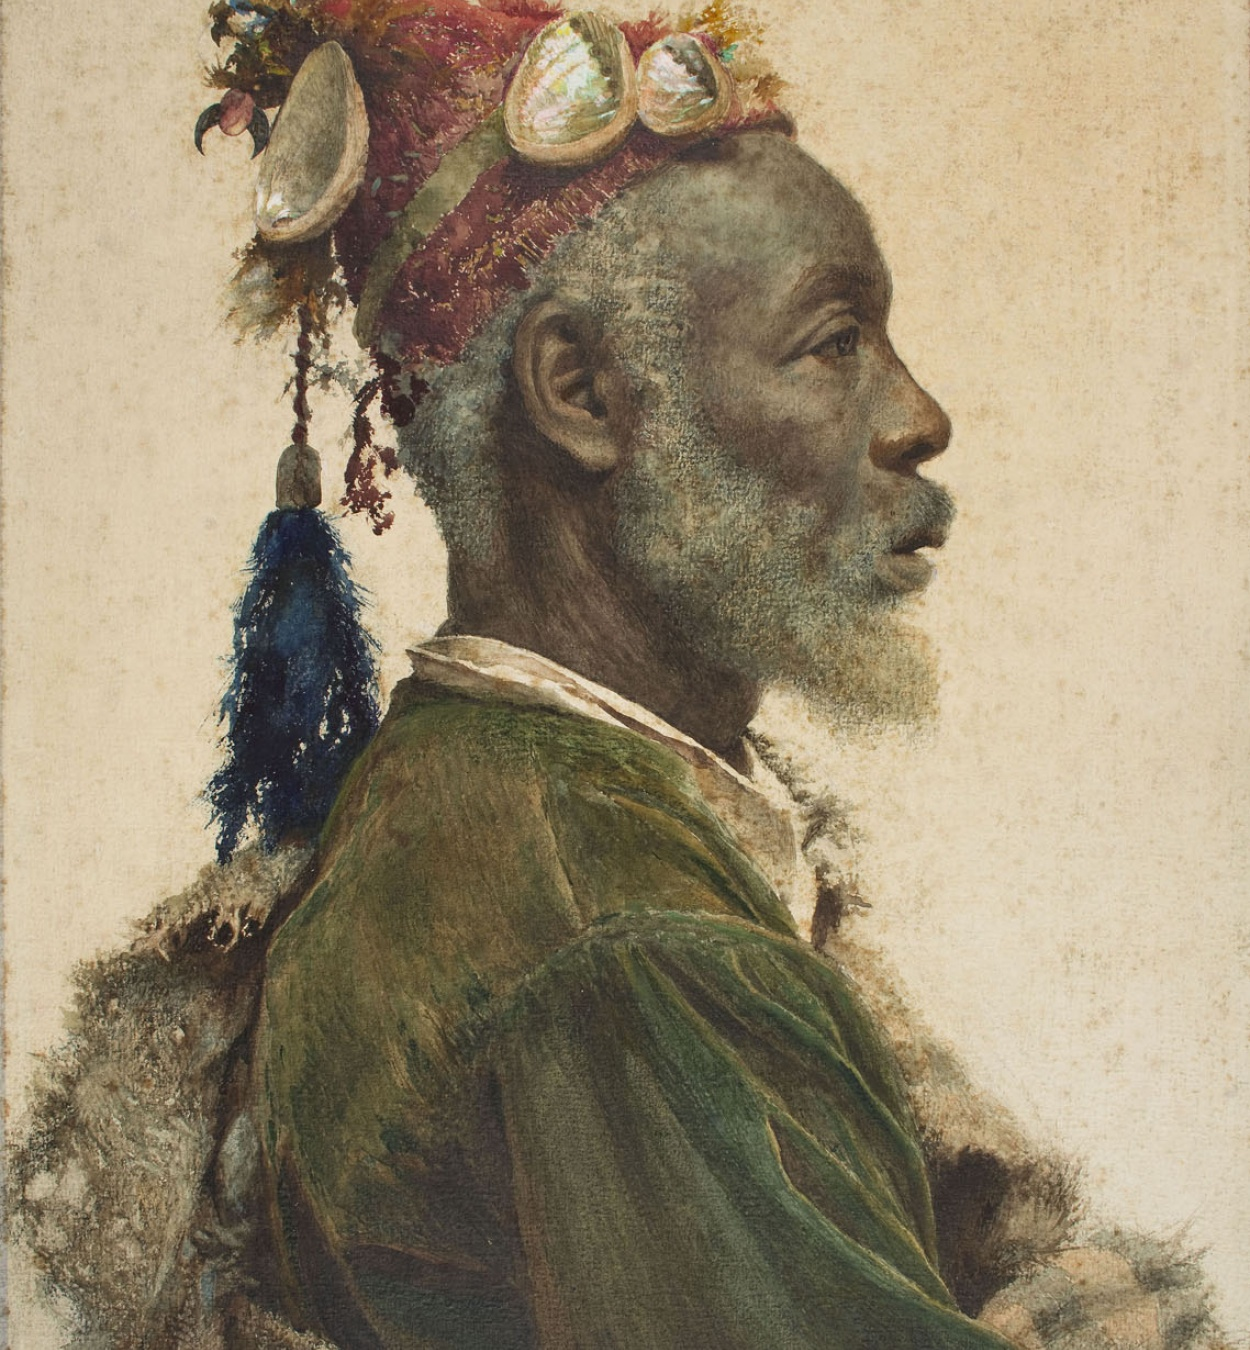 Josep Tapiró. El santón darcawi de Marrakech, c. 1895. Museu Nacional d'Art de Catalunya, Barcelona